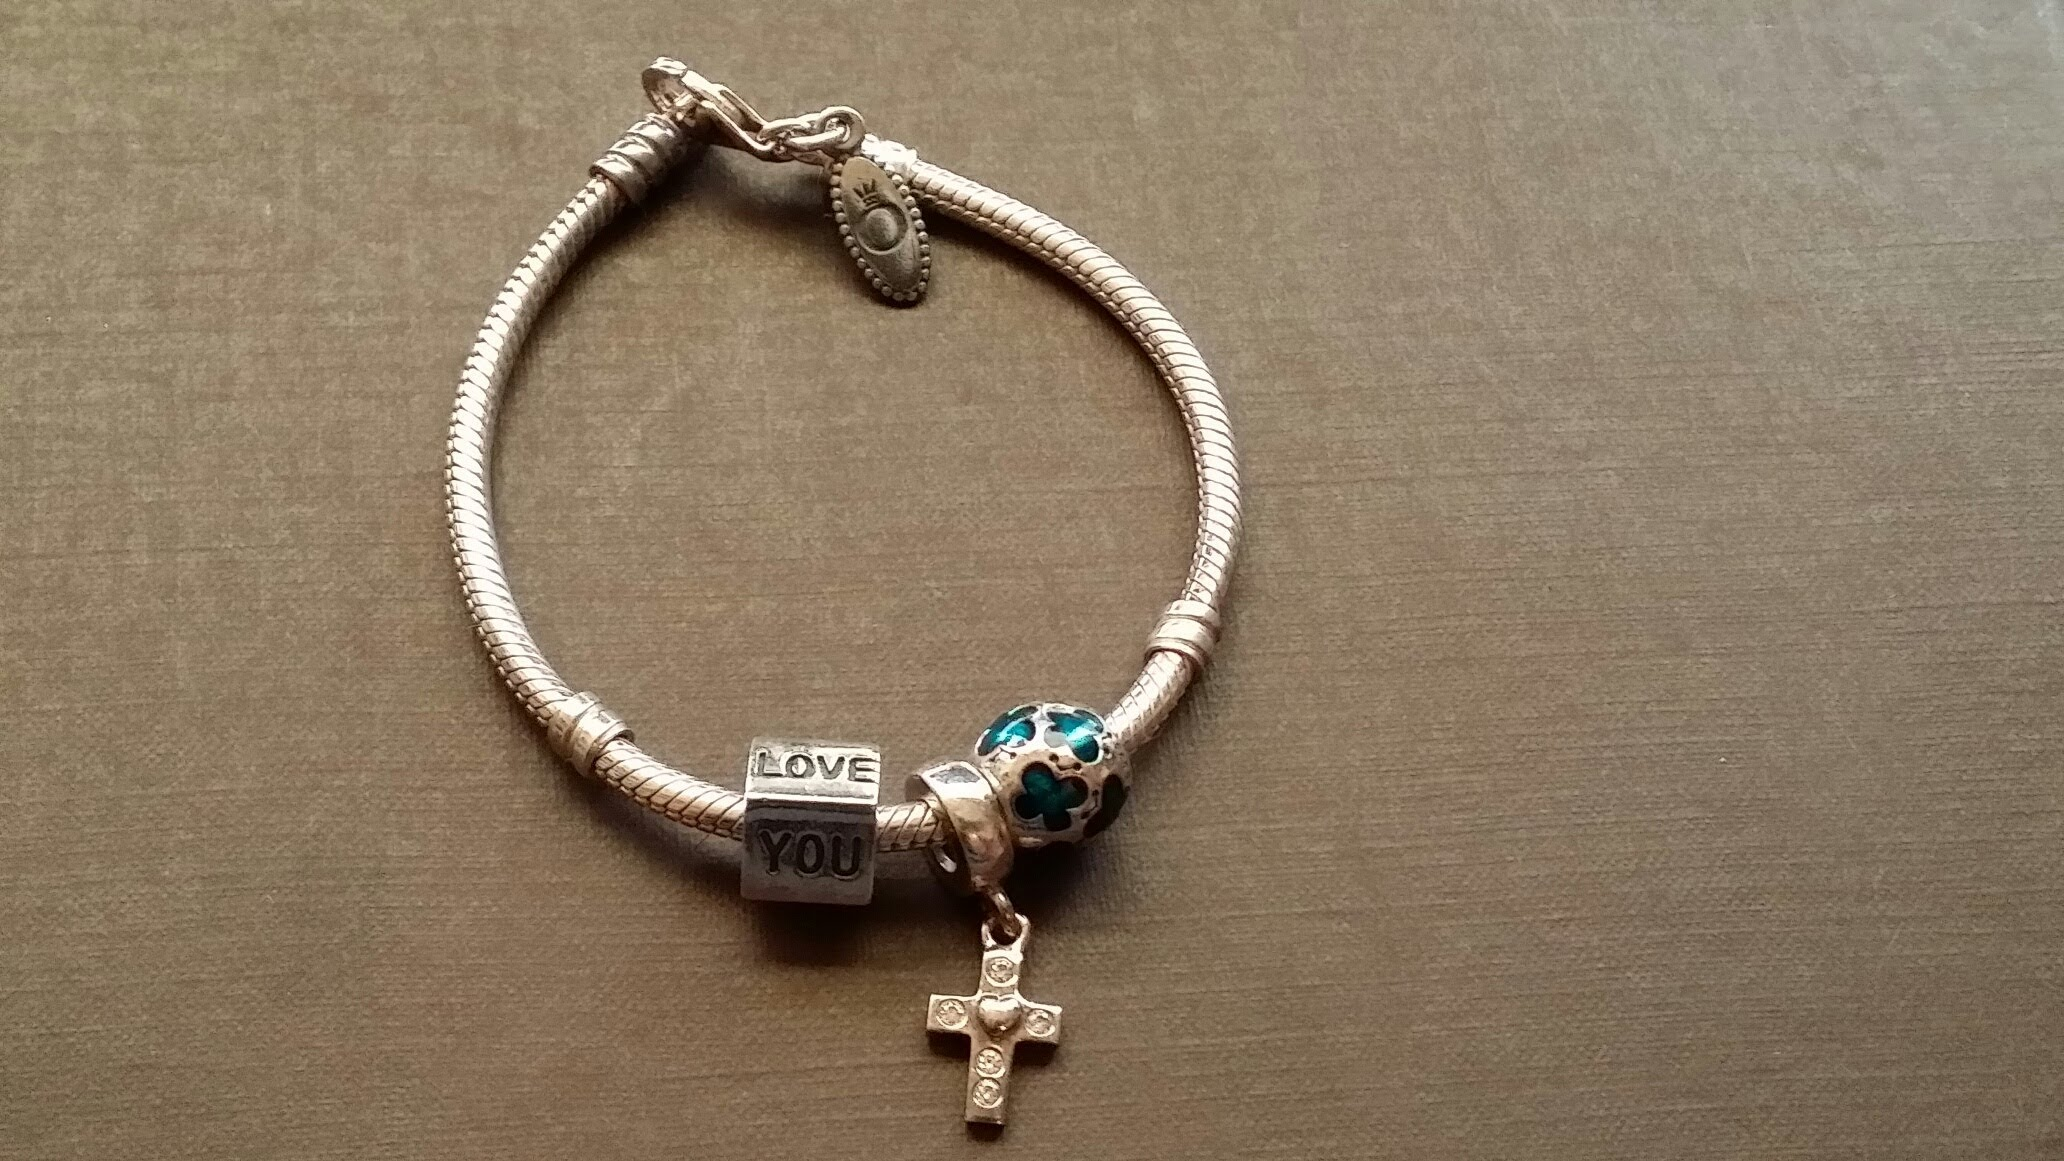 96a32c67b pandora bracelet keeps tarnishing